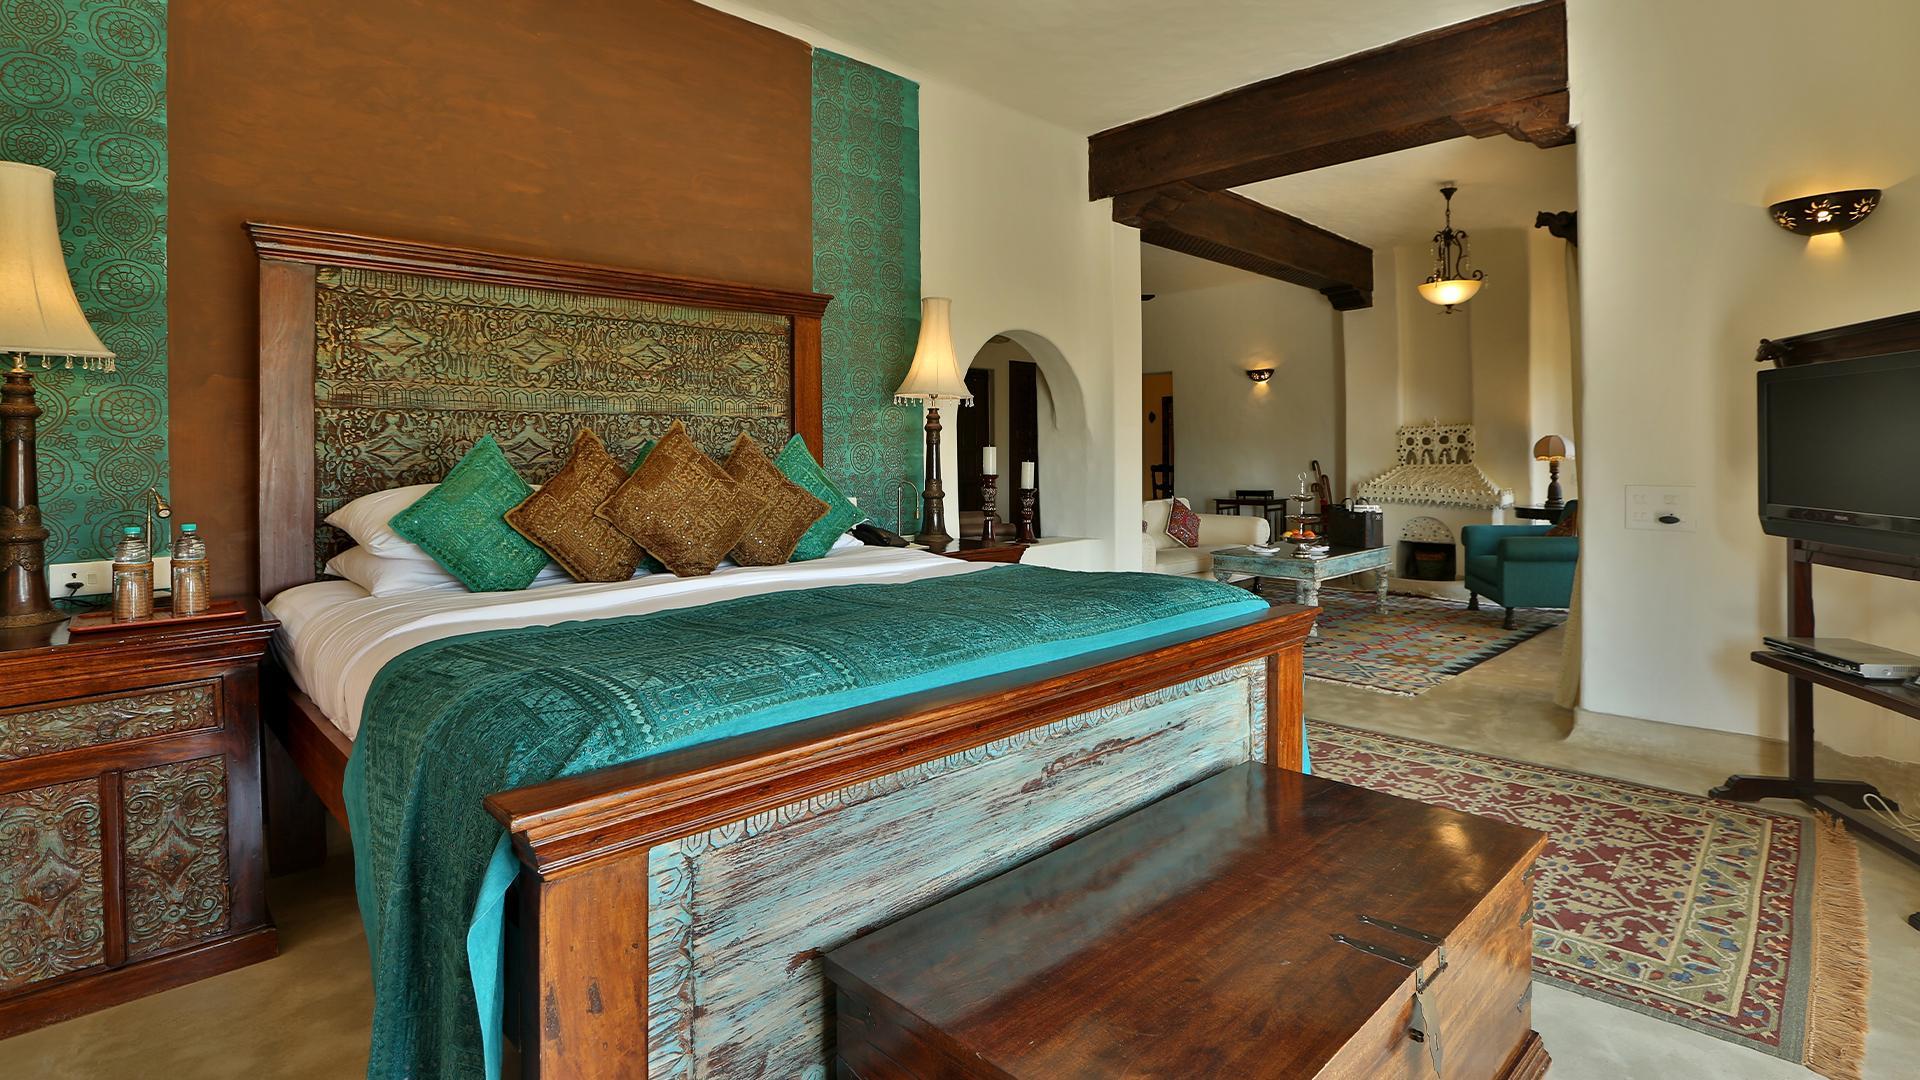 Suite image 1 at Mihir Garh by Pali, Rajasthan, India